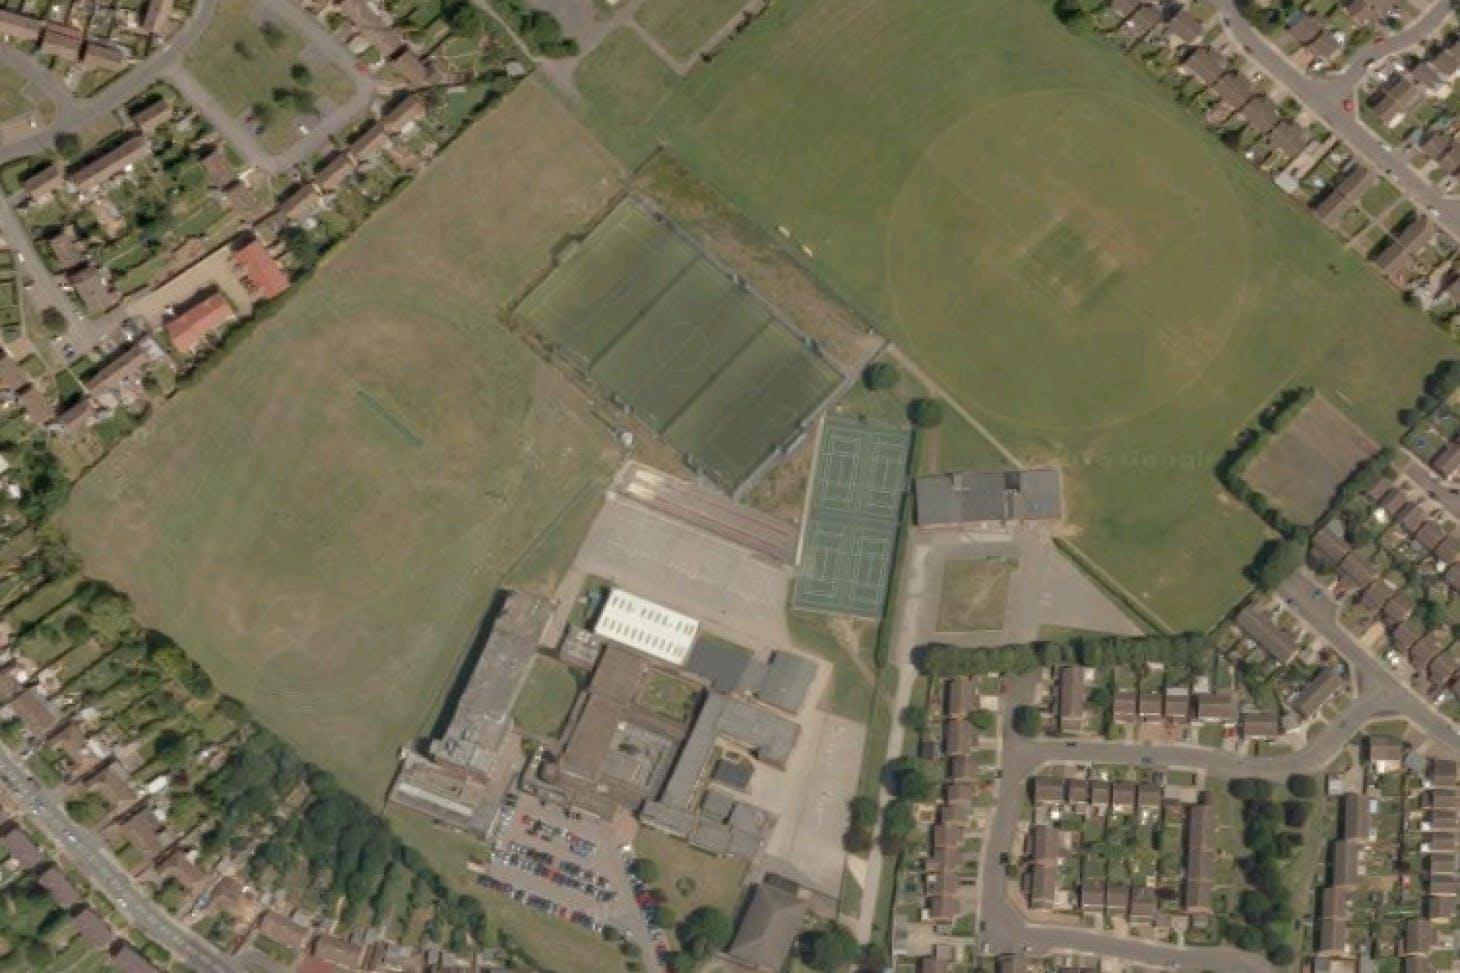 Ashcroft High School Full size | Grass cricket facilities